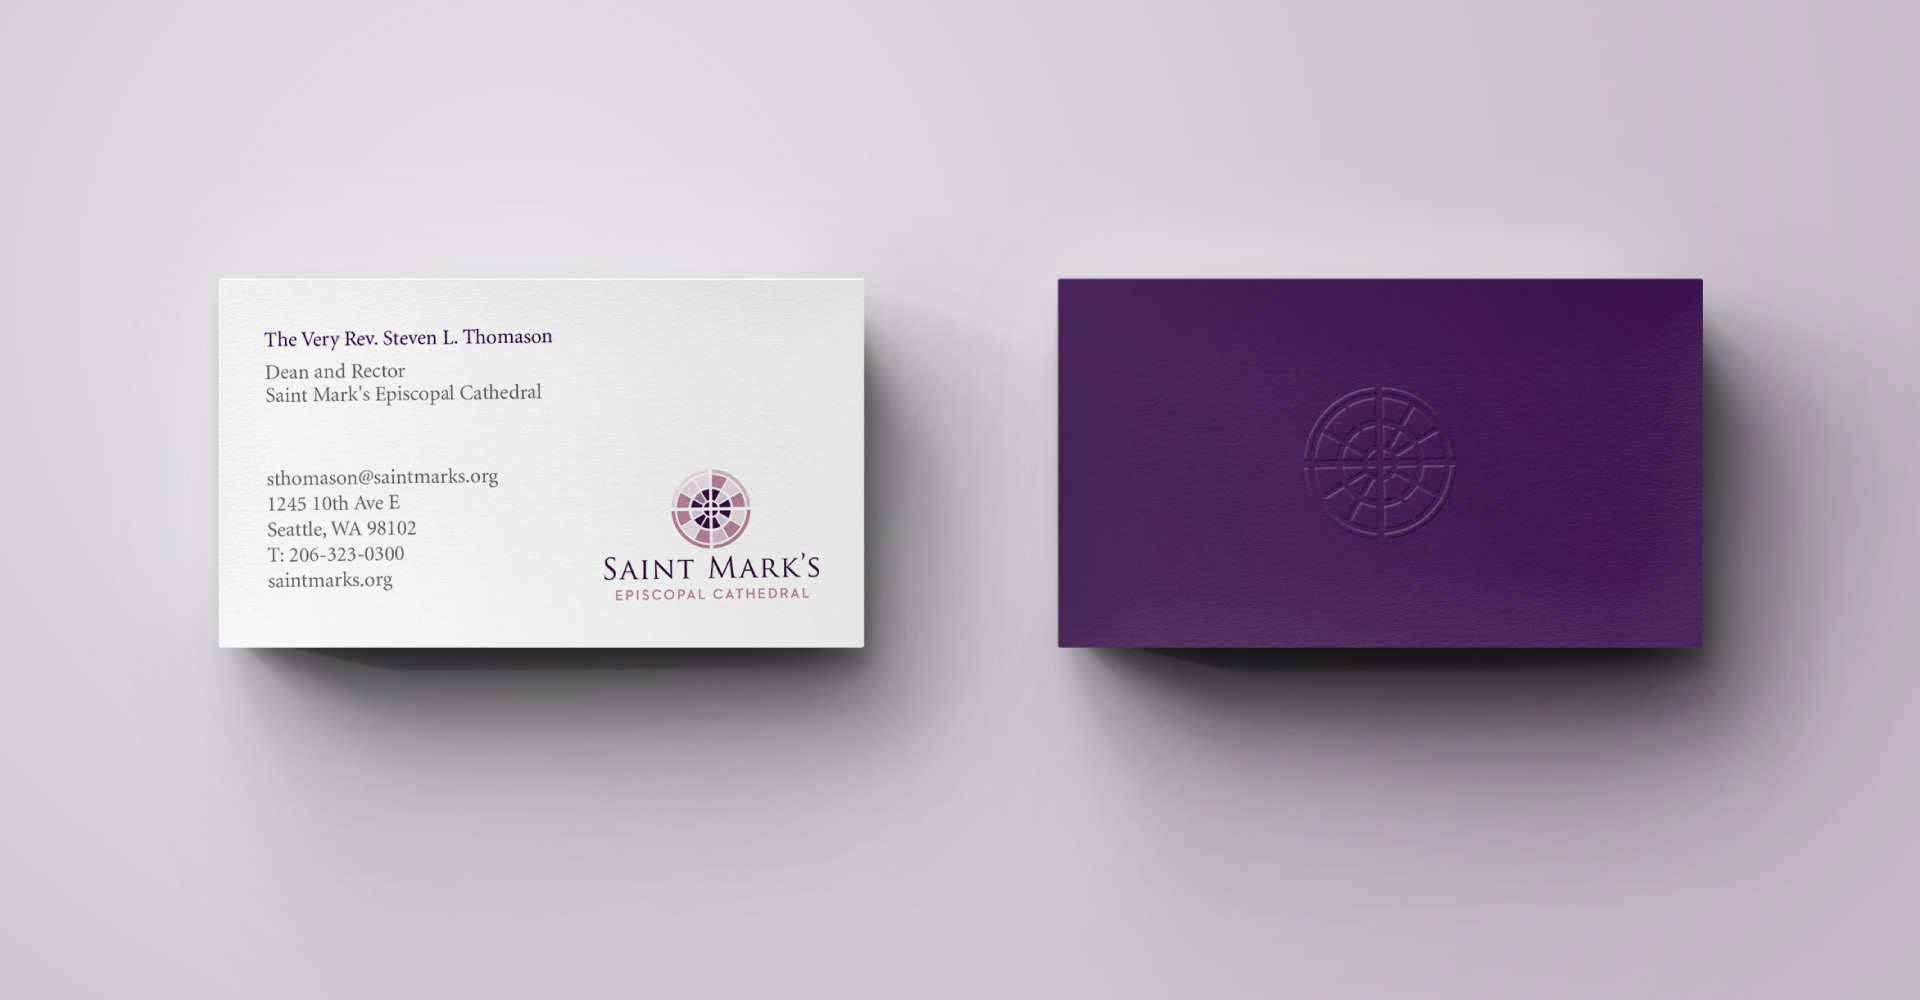 Creative_Retail_Packaging_Saint_Marks_Episcopal_Cathedral_Branding_Identity_7.jpg